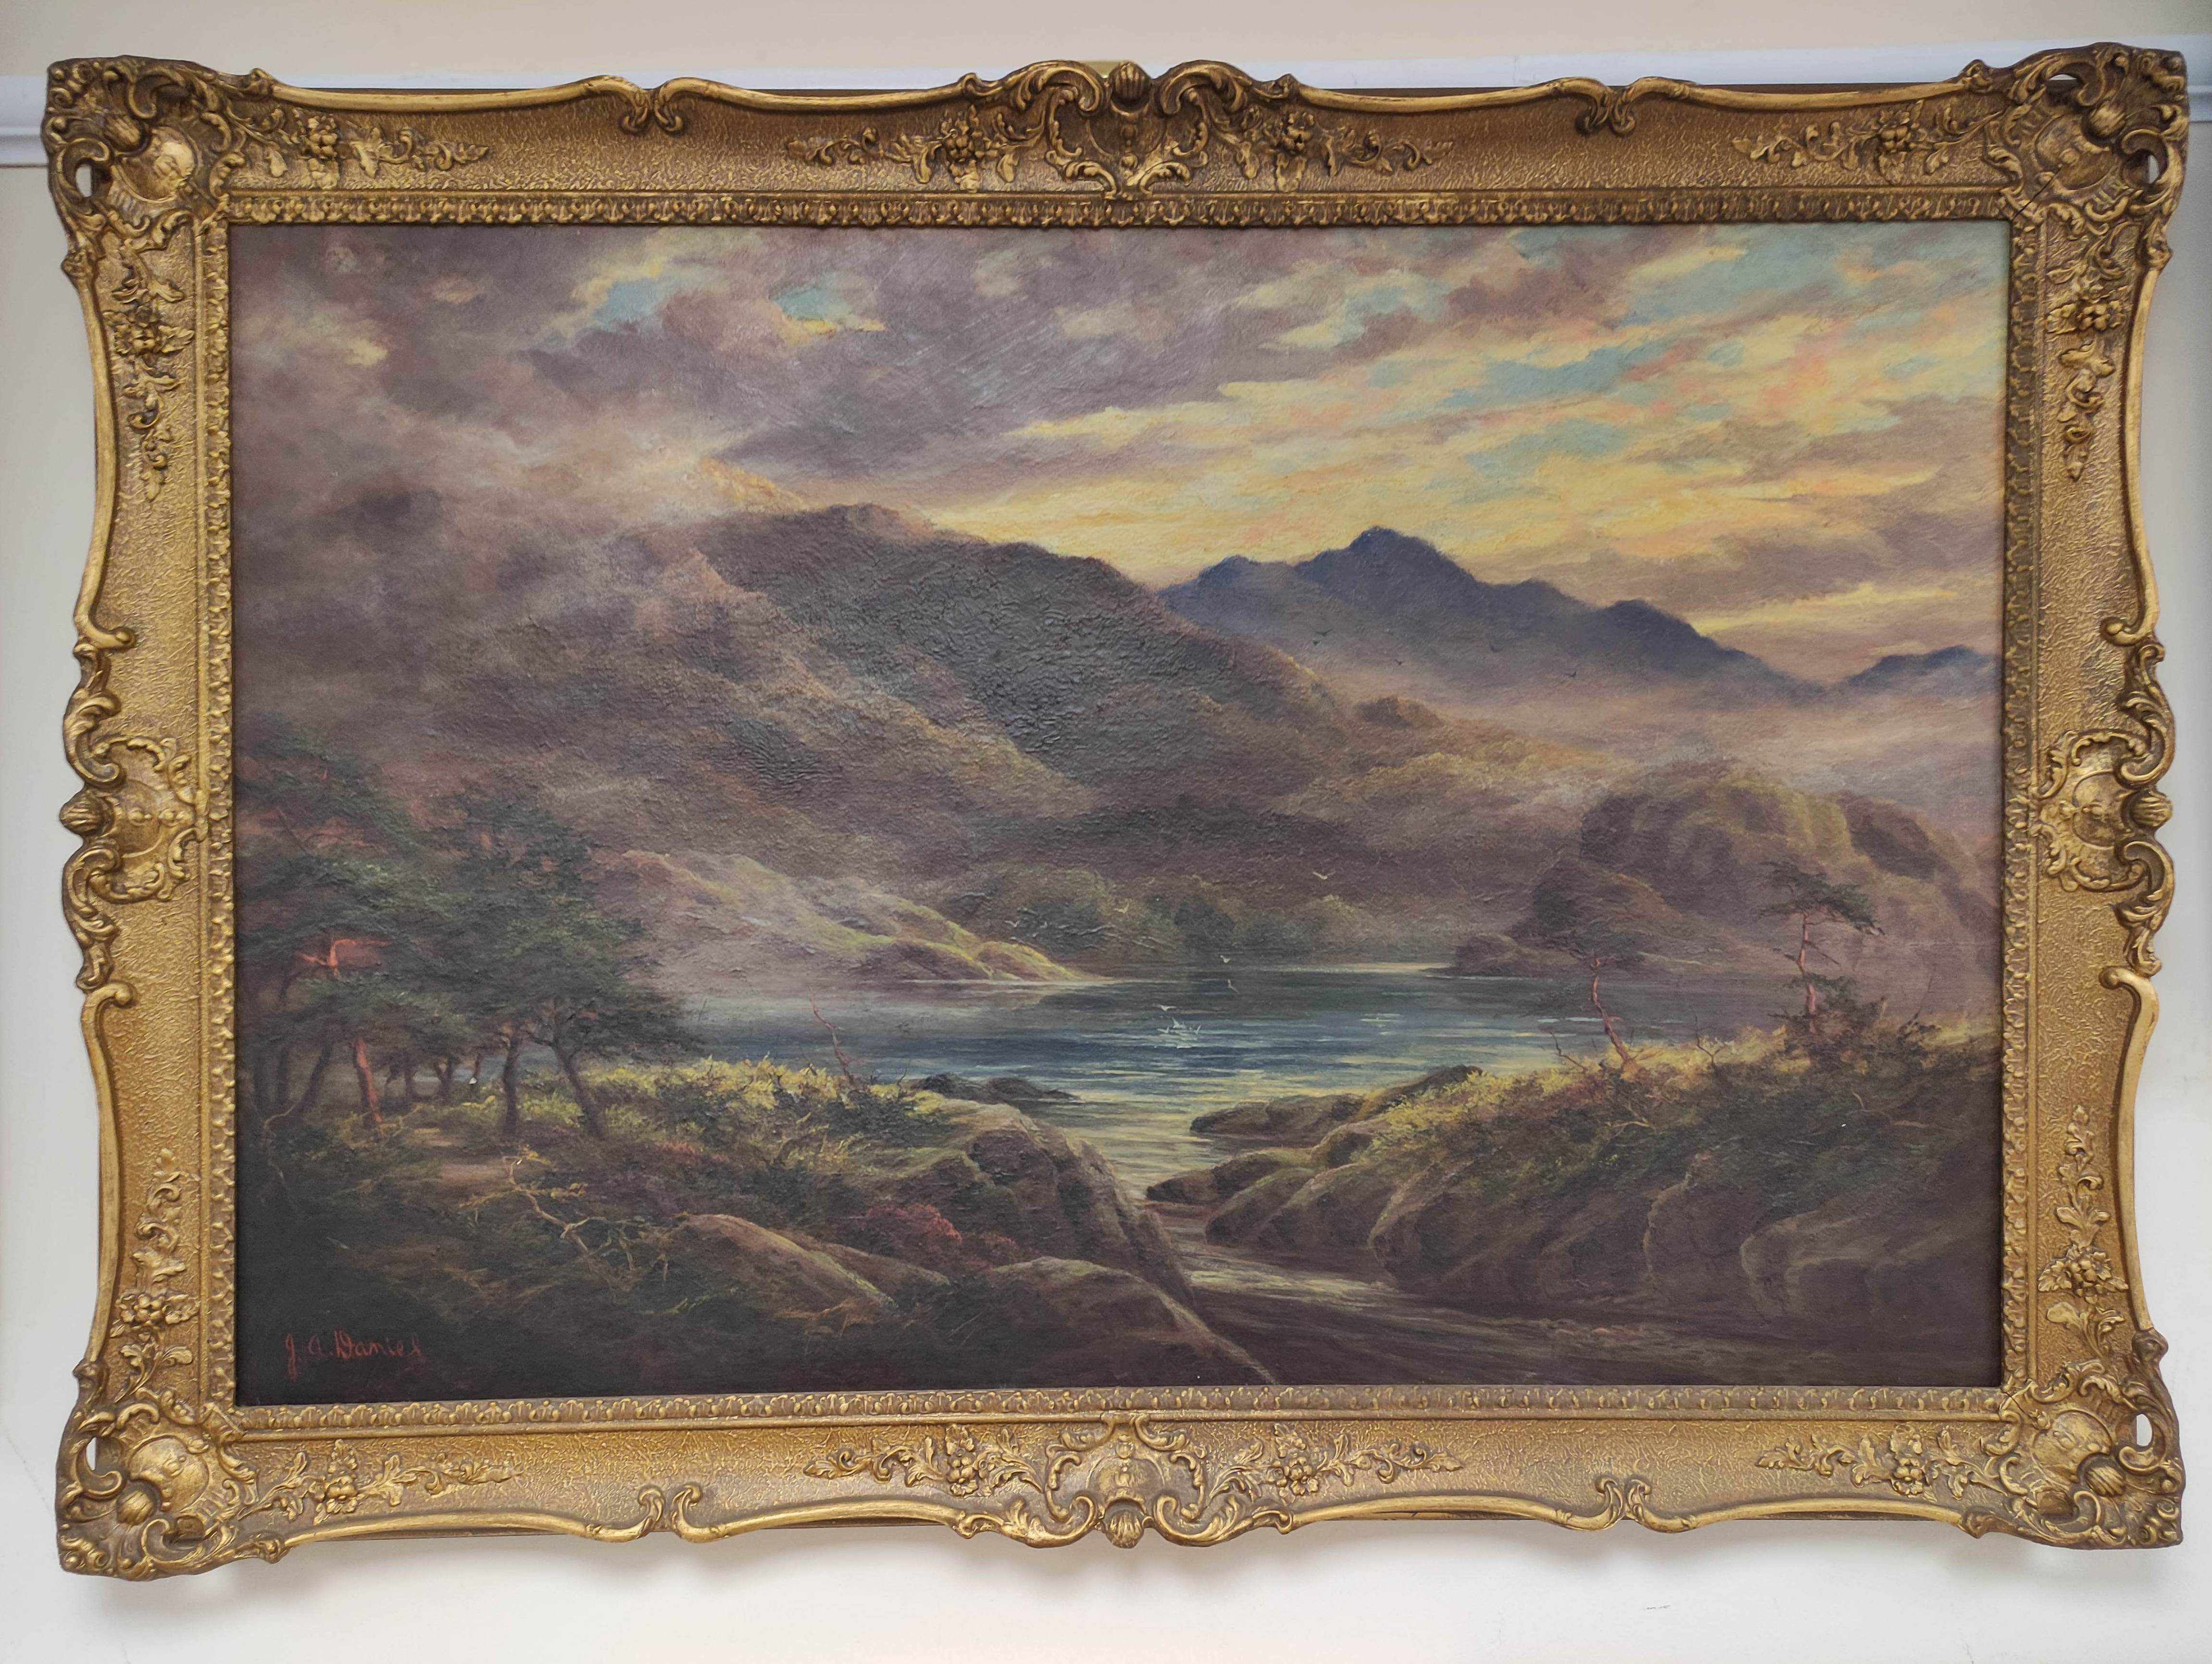 J. A. DANIEL. Loch Aylort. Signed, oil on canvas. 60cm x 90cm.